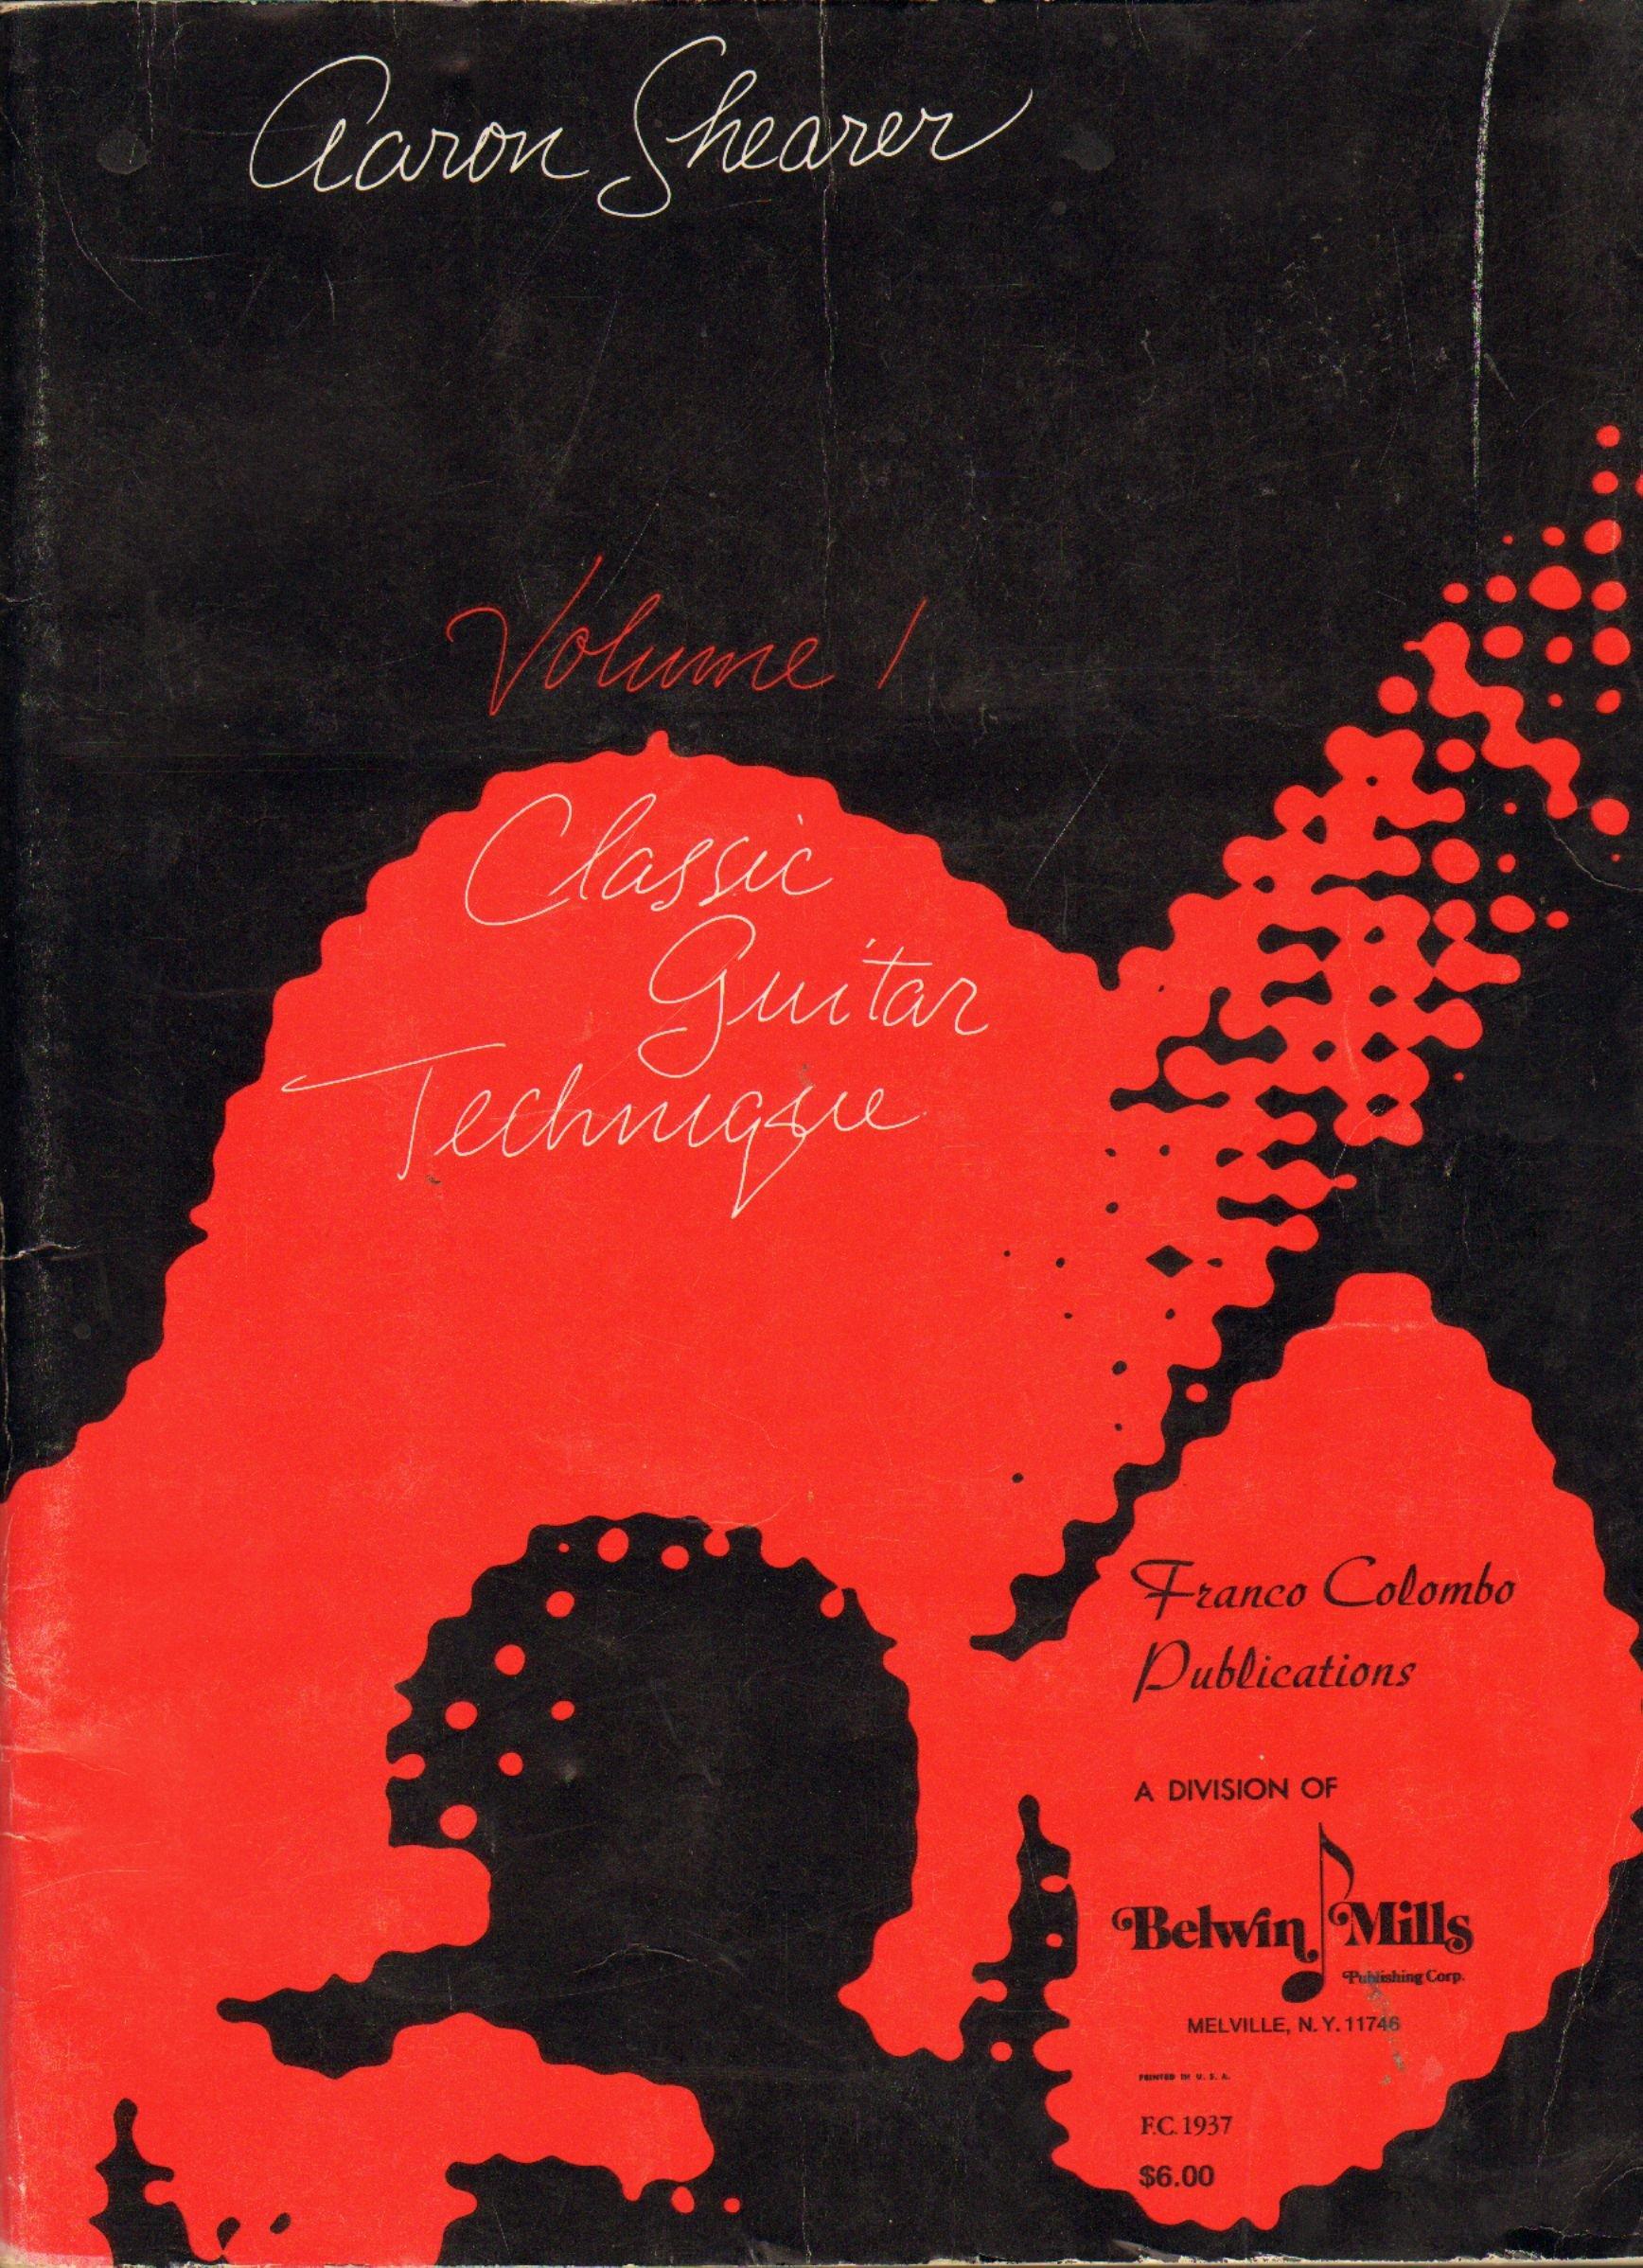 CLASSIC GUITAR TECHNIQUE  Volume I, Shearer, Aaron